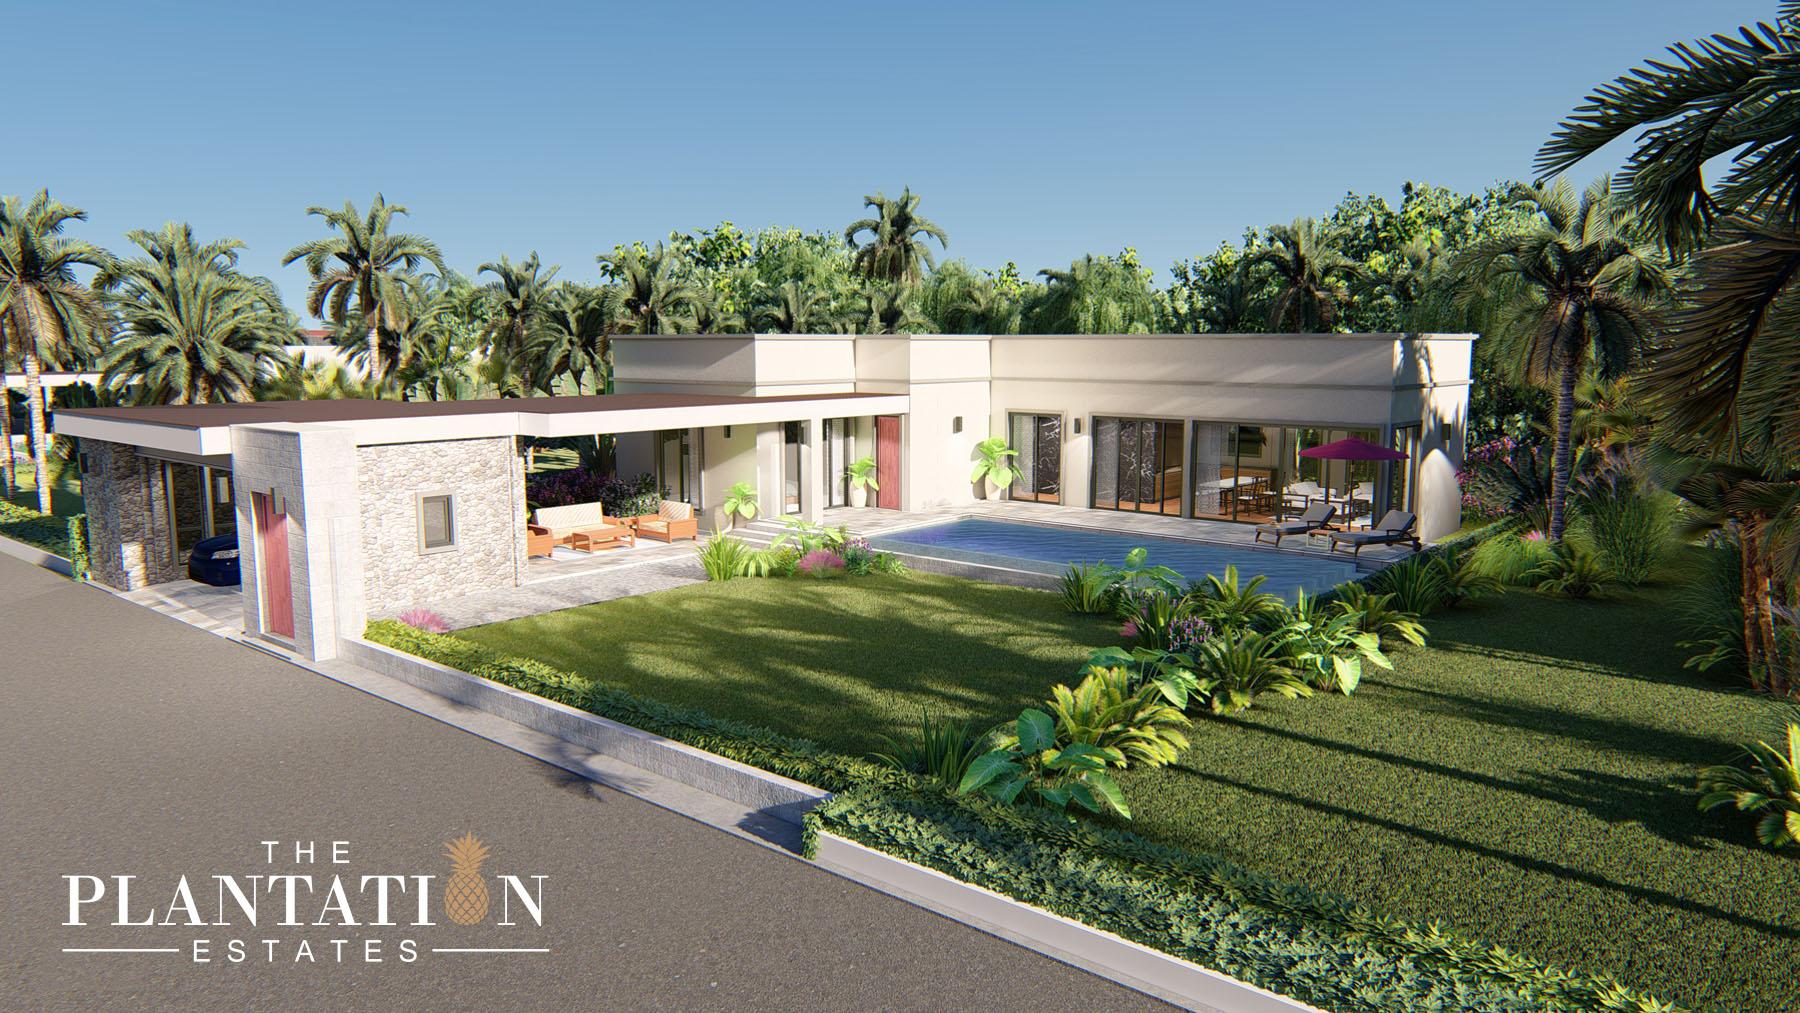 House Design Types The Plantation Estates Thailand